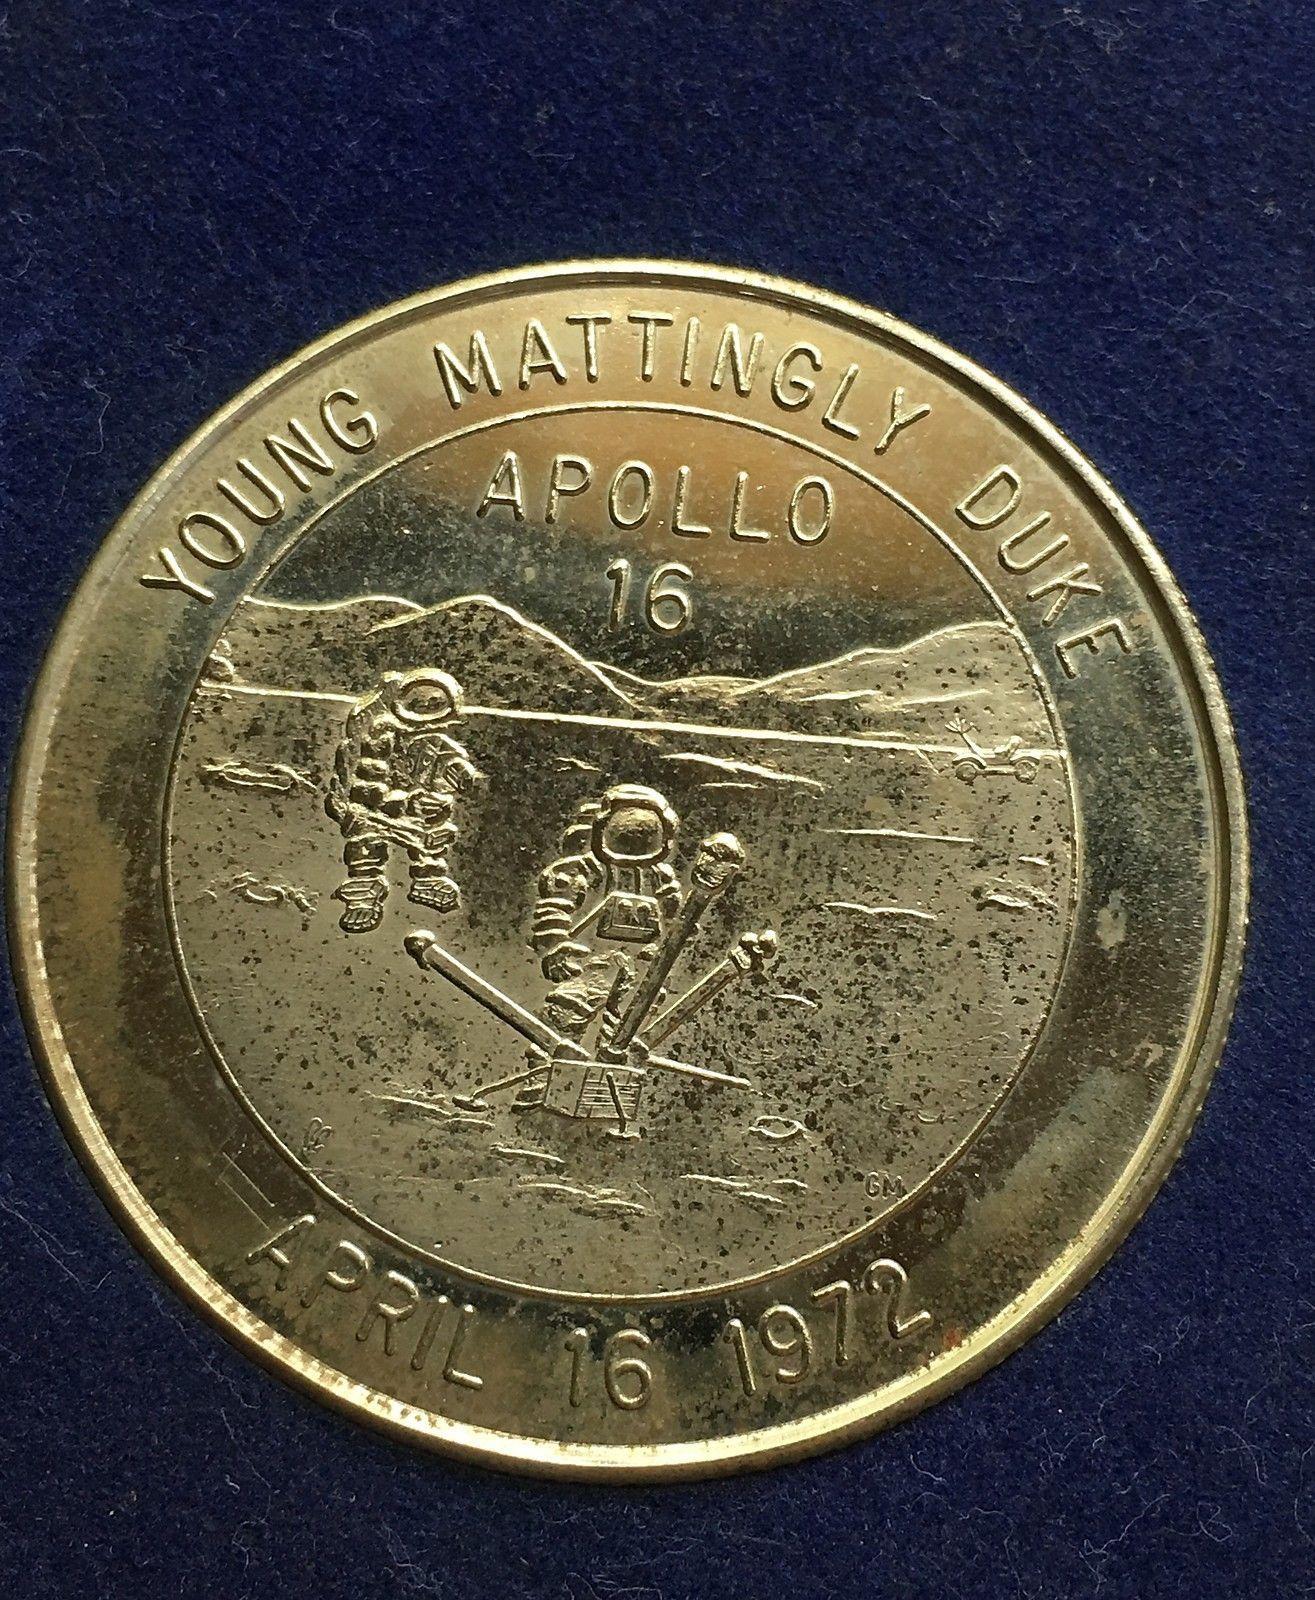 1972 USA Silver Medal Commemorative Sterling Silver Coin Apollo 16 39MM 21G